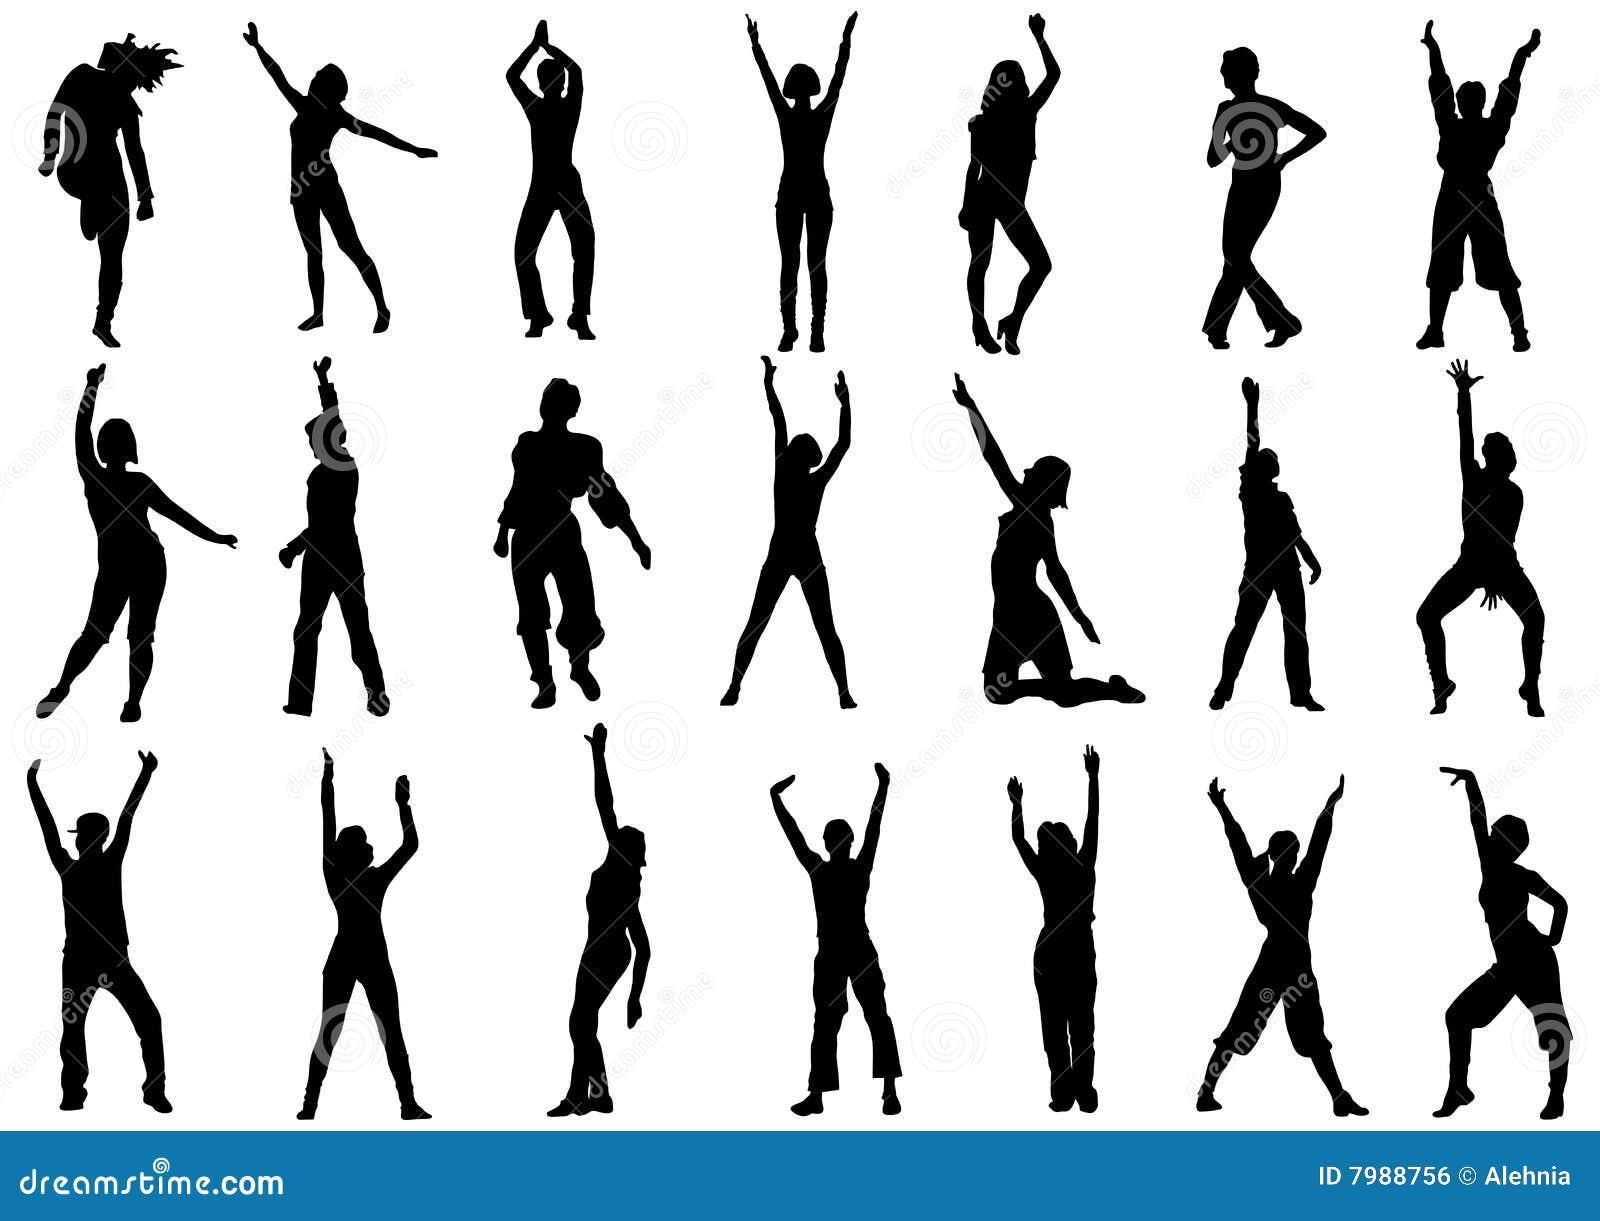 Dancing Girls In Action Illustration Stock Vector ...